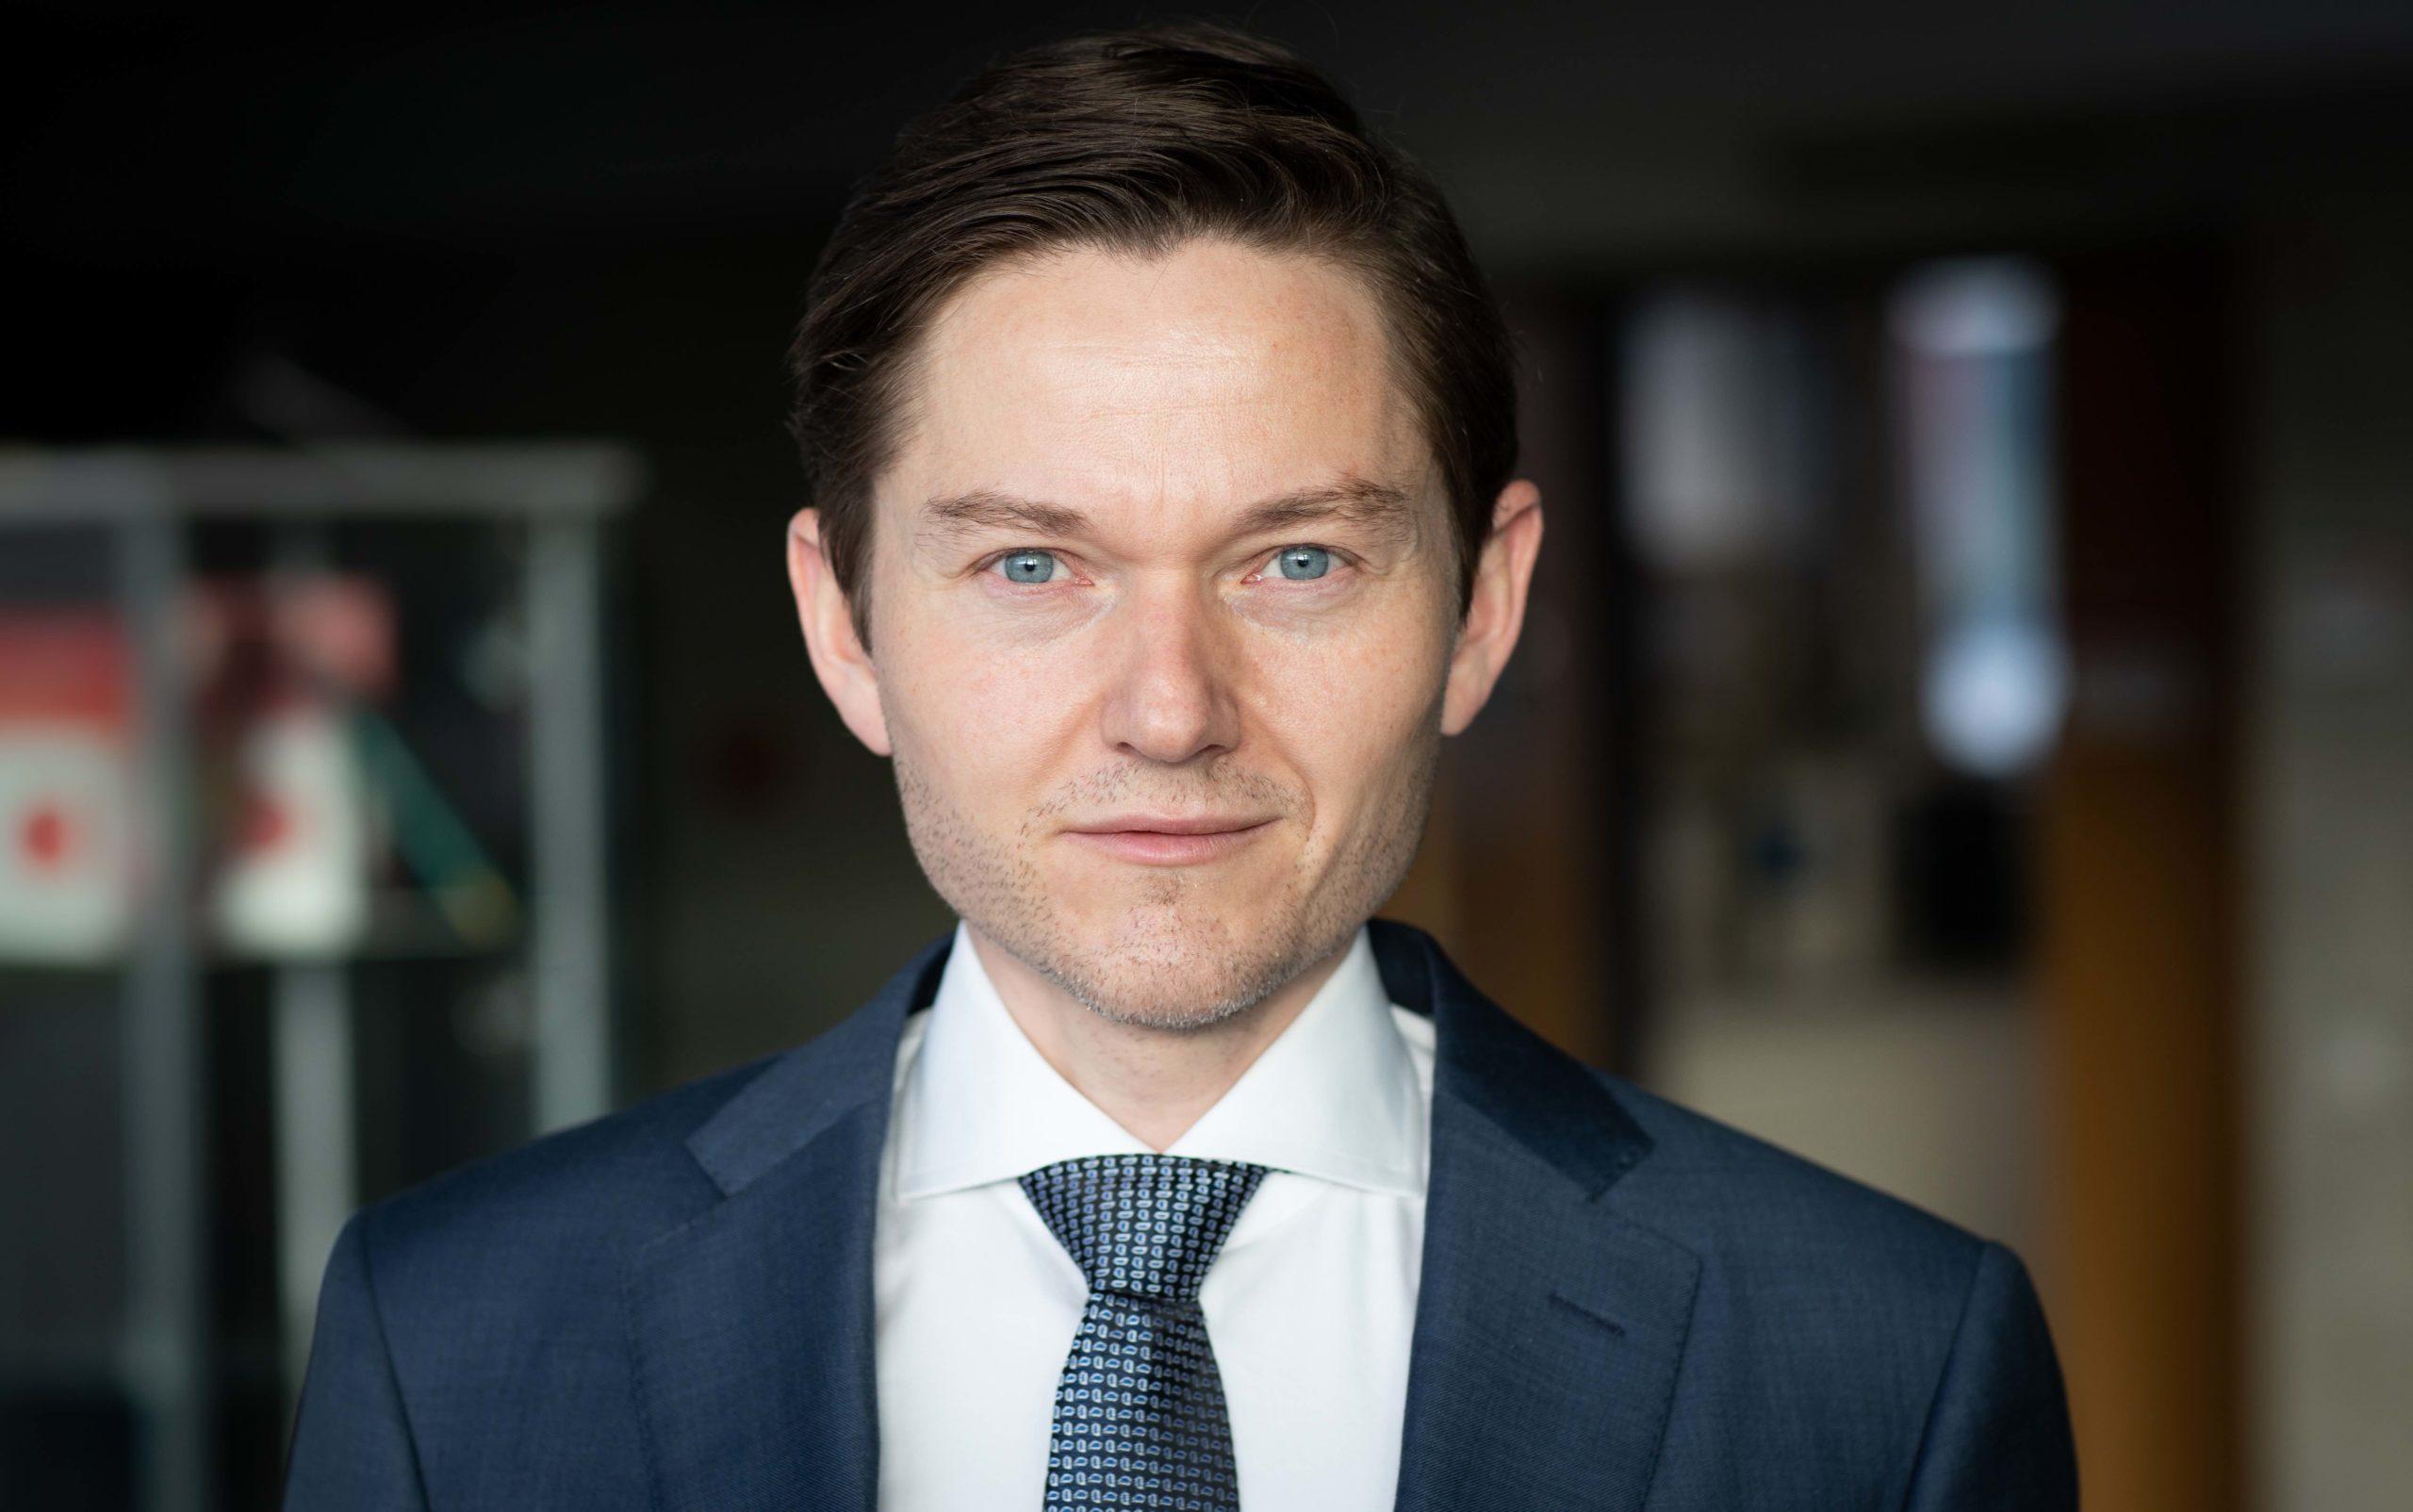 Prof. Dr.-Ing. Holger Ruckdäschel | Polymer Engineering Bayreuth